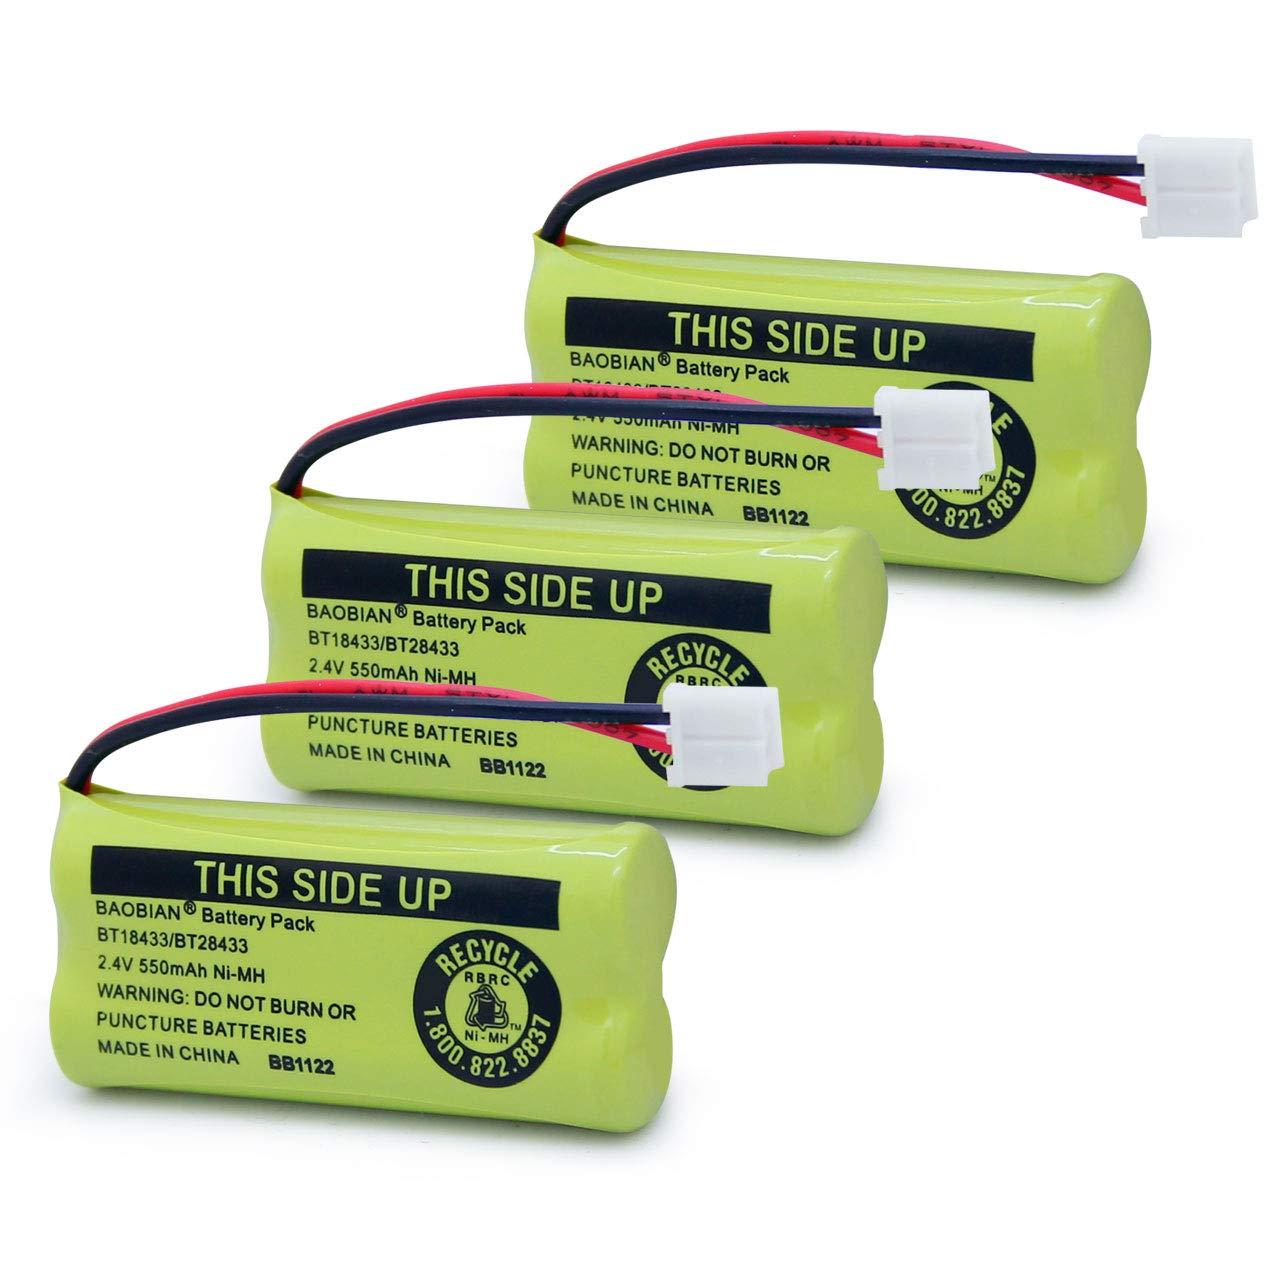 BAOBIAN BT18433 BT28433 Cordless Phone Battery 2.4V 550mAh Ni-MH BT-18433 BT-28433 BT184342 BT284342 BT1011 BT-1011 BT-1018 BT-1022 BT8000 BT8001 BT8300 BT6010 CPH-515D CPH515D (Pack of 3)